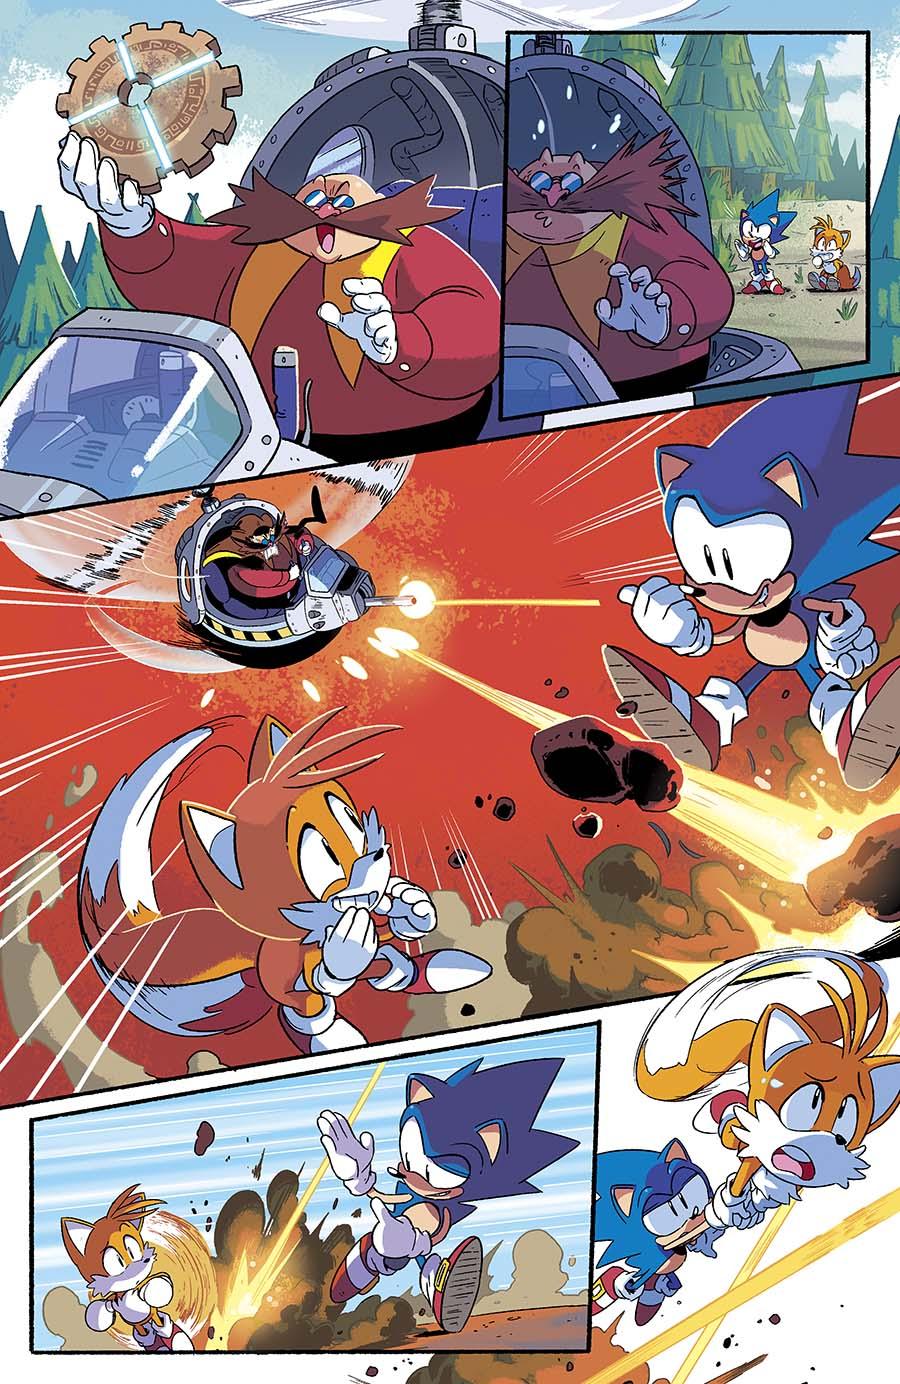 http://www.sonicretro.org/wp-content/uploads/2016/06/Sonic-Mega-Drive-preview-2.jpg